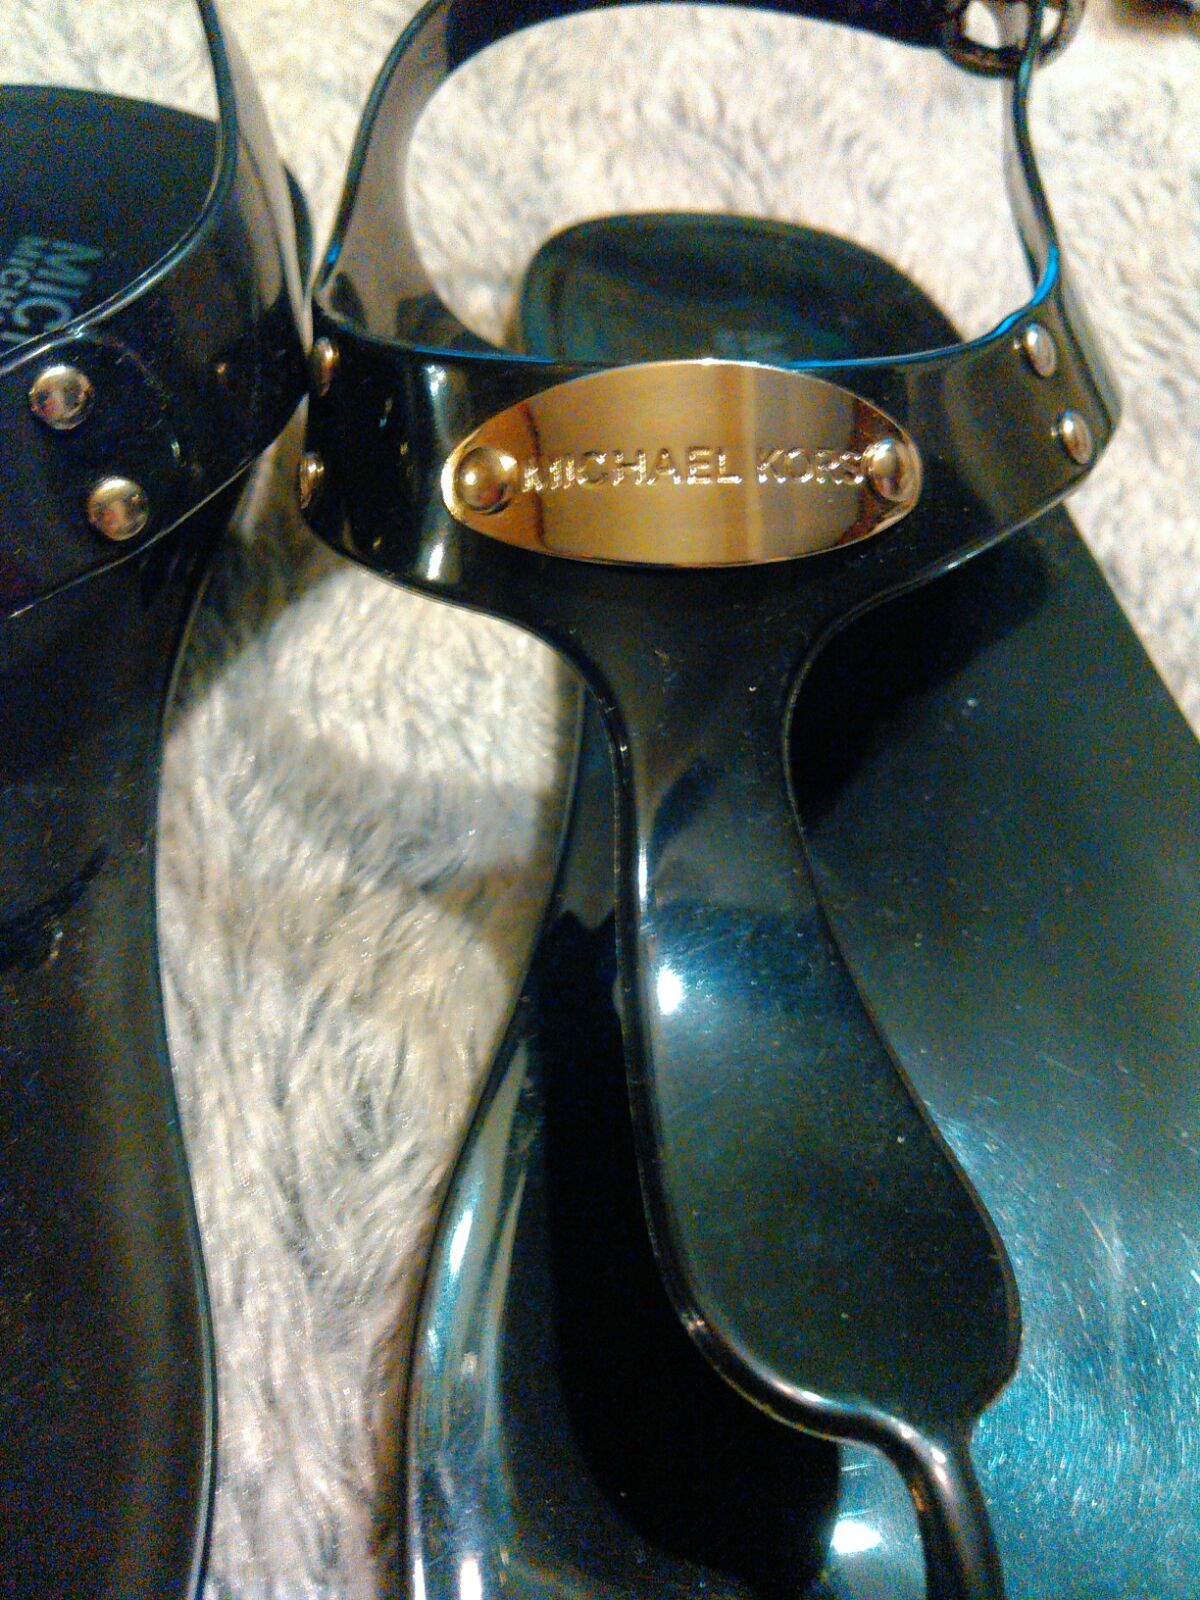 Michael Kors jelly sandals Size 7